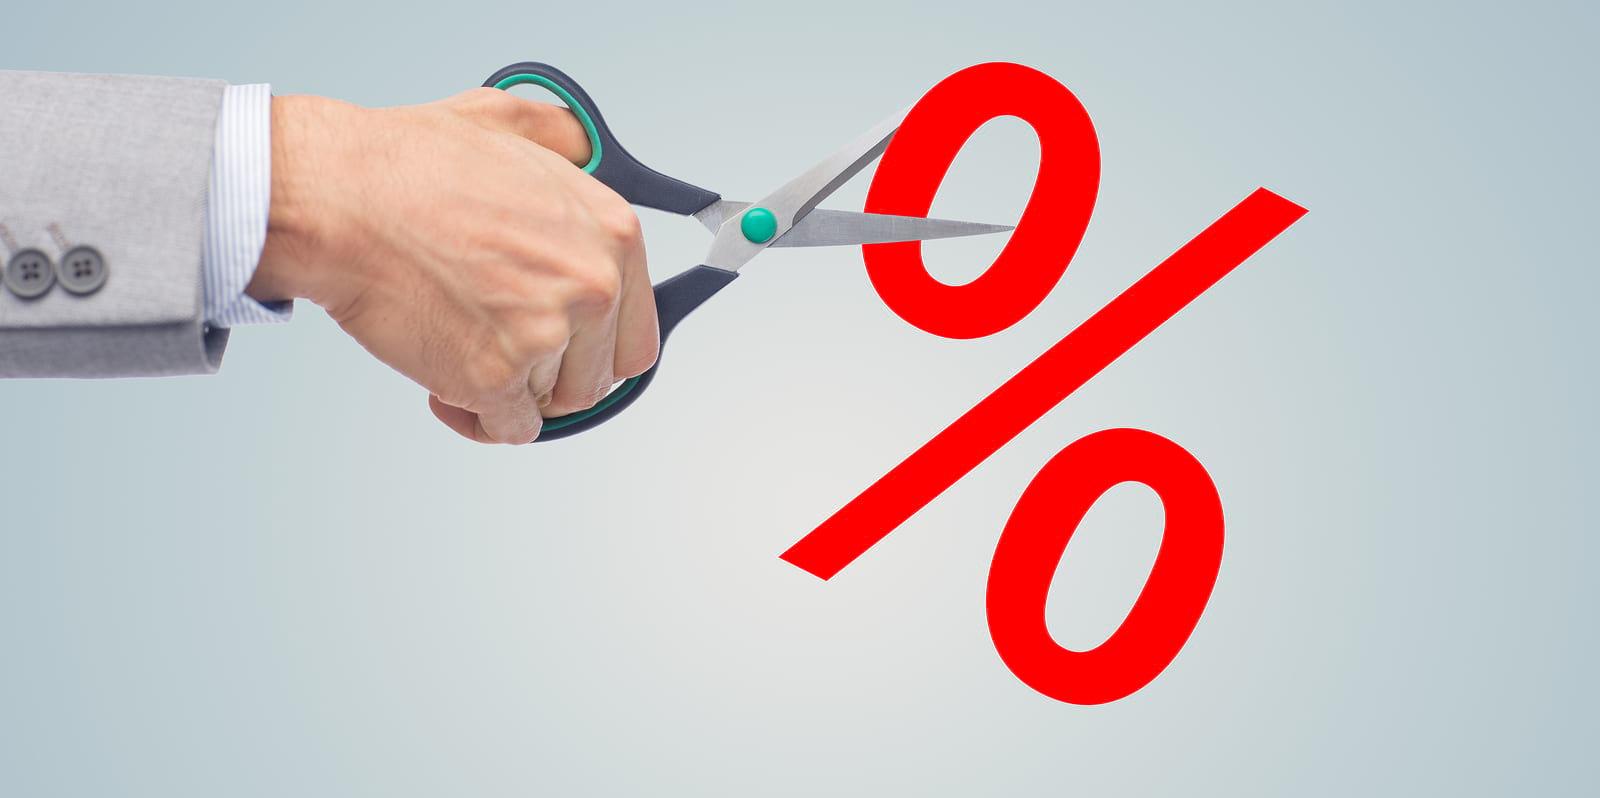 Изображение - Налог на землю для пенсионеров wsi-imageoptim-bigstock-business-people-financial-cr-91049471